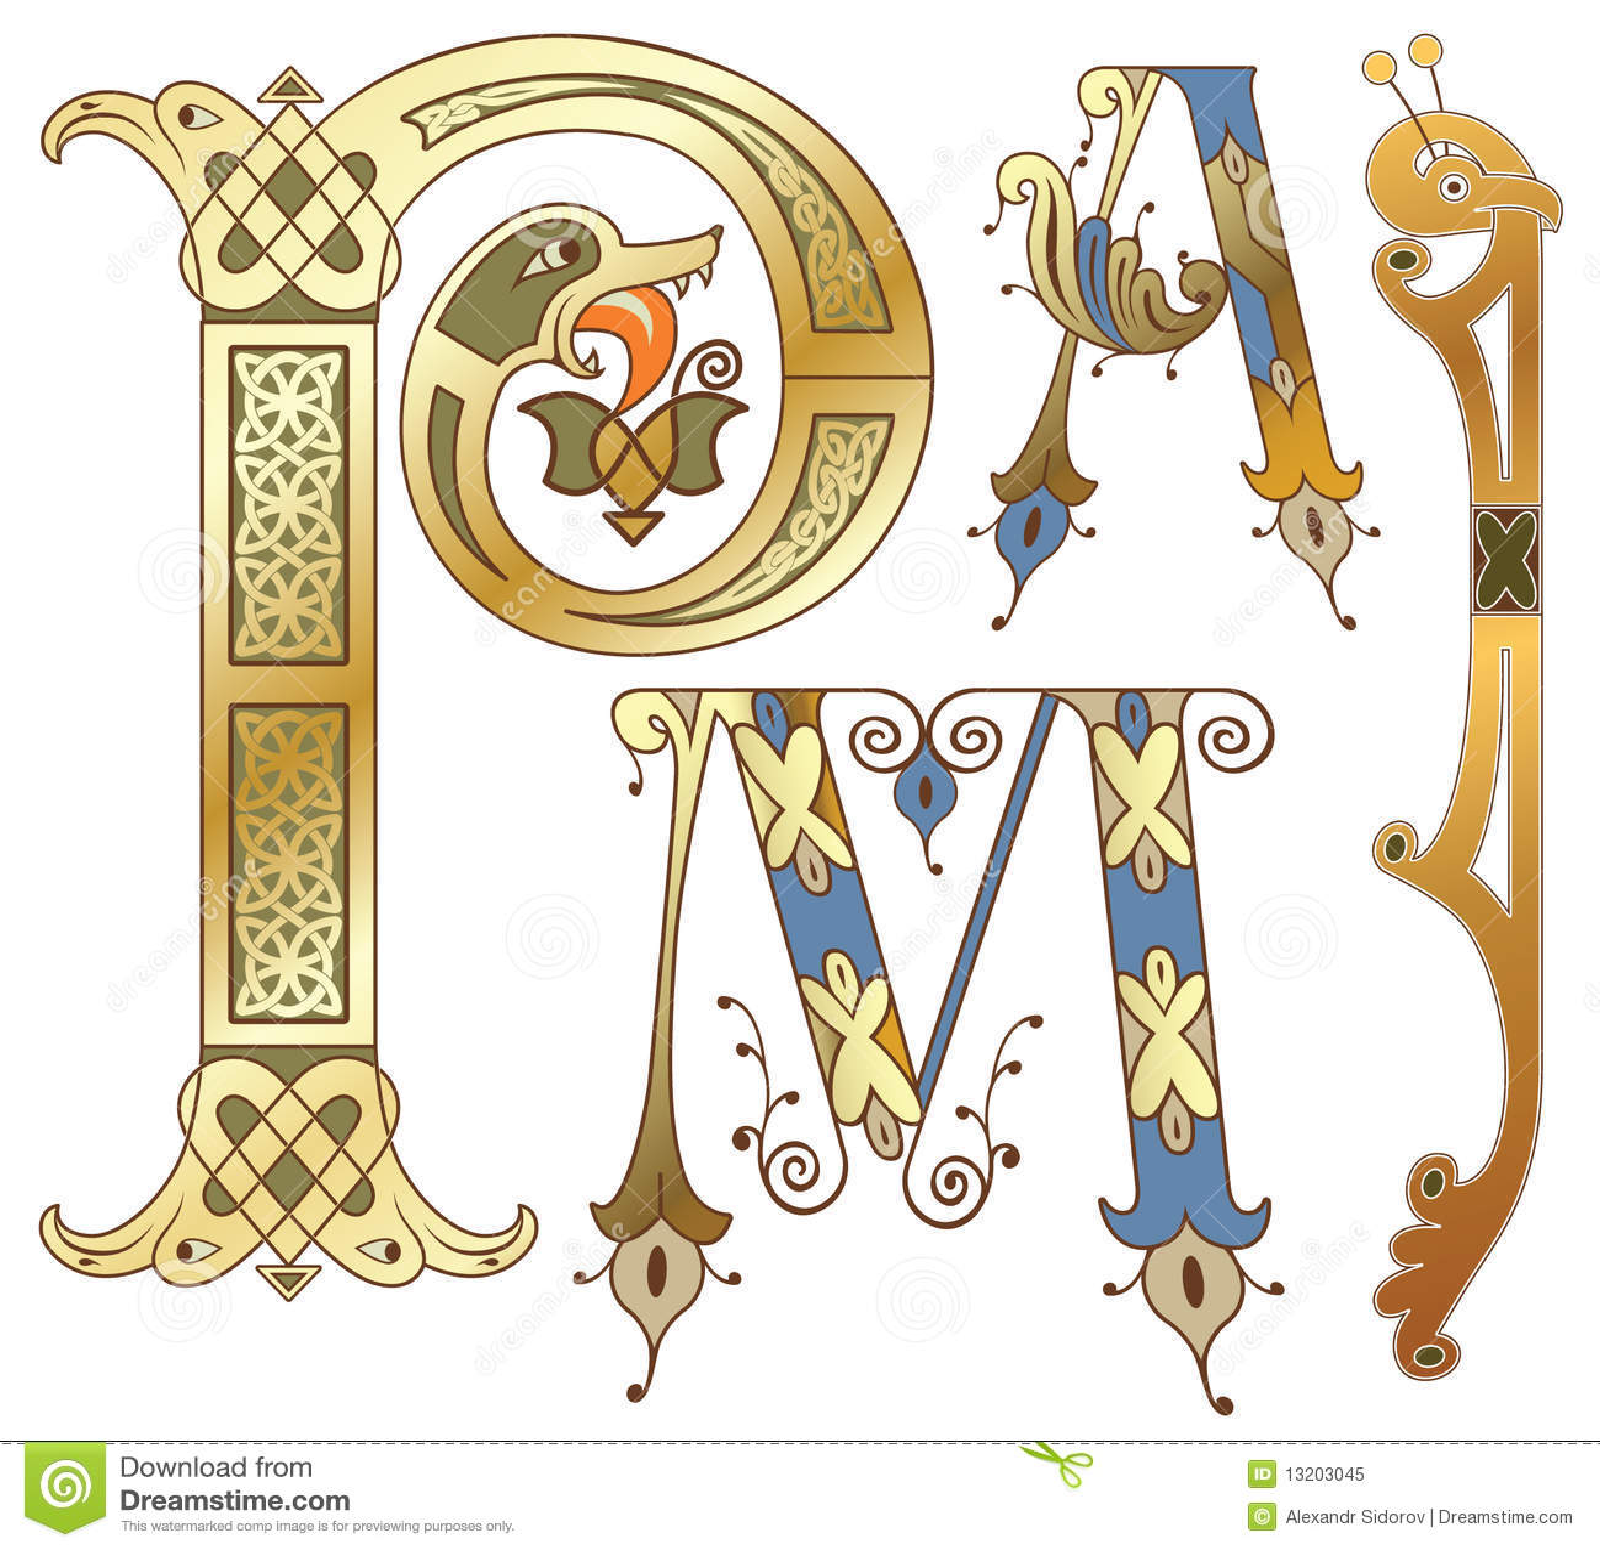 initials royalty free stock photo